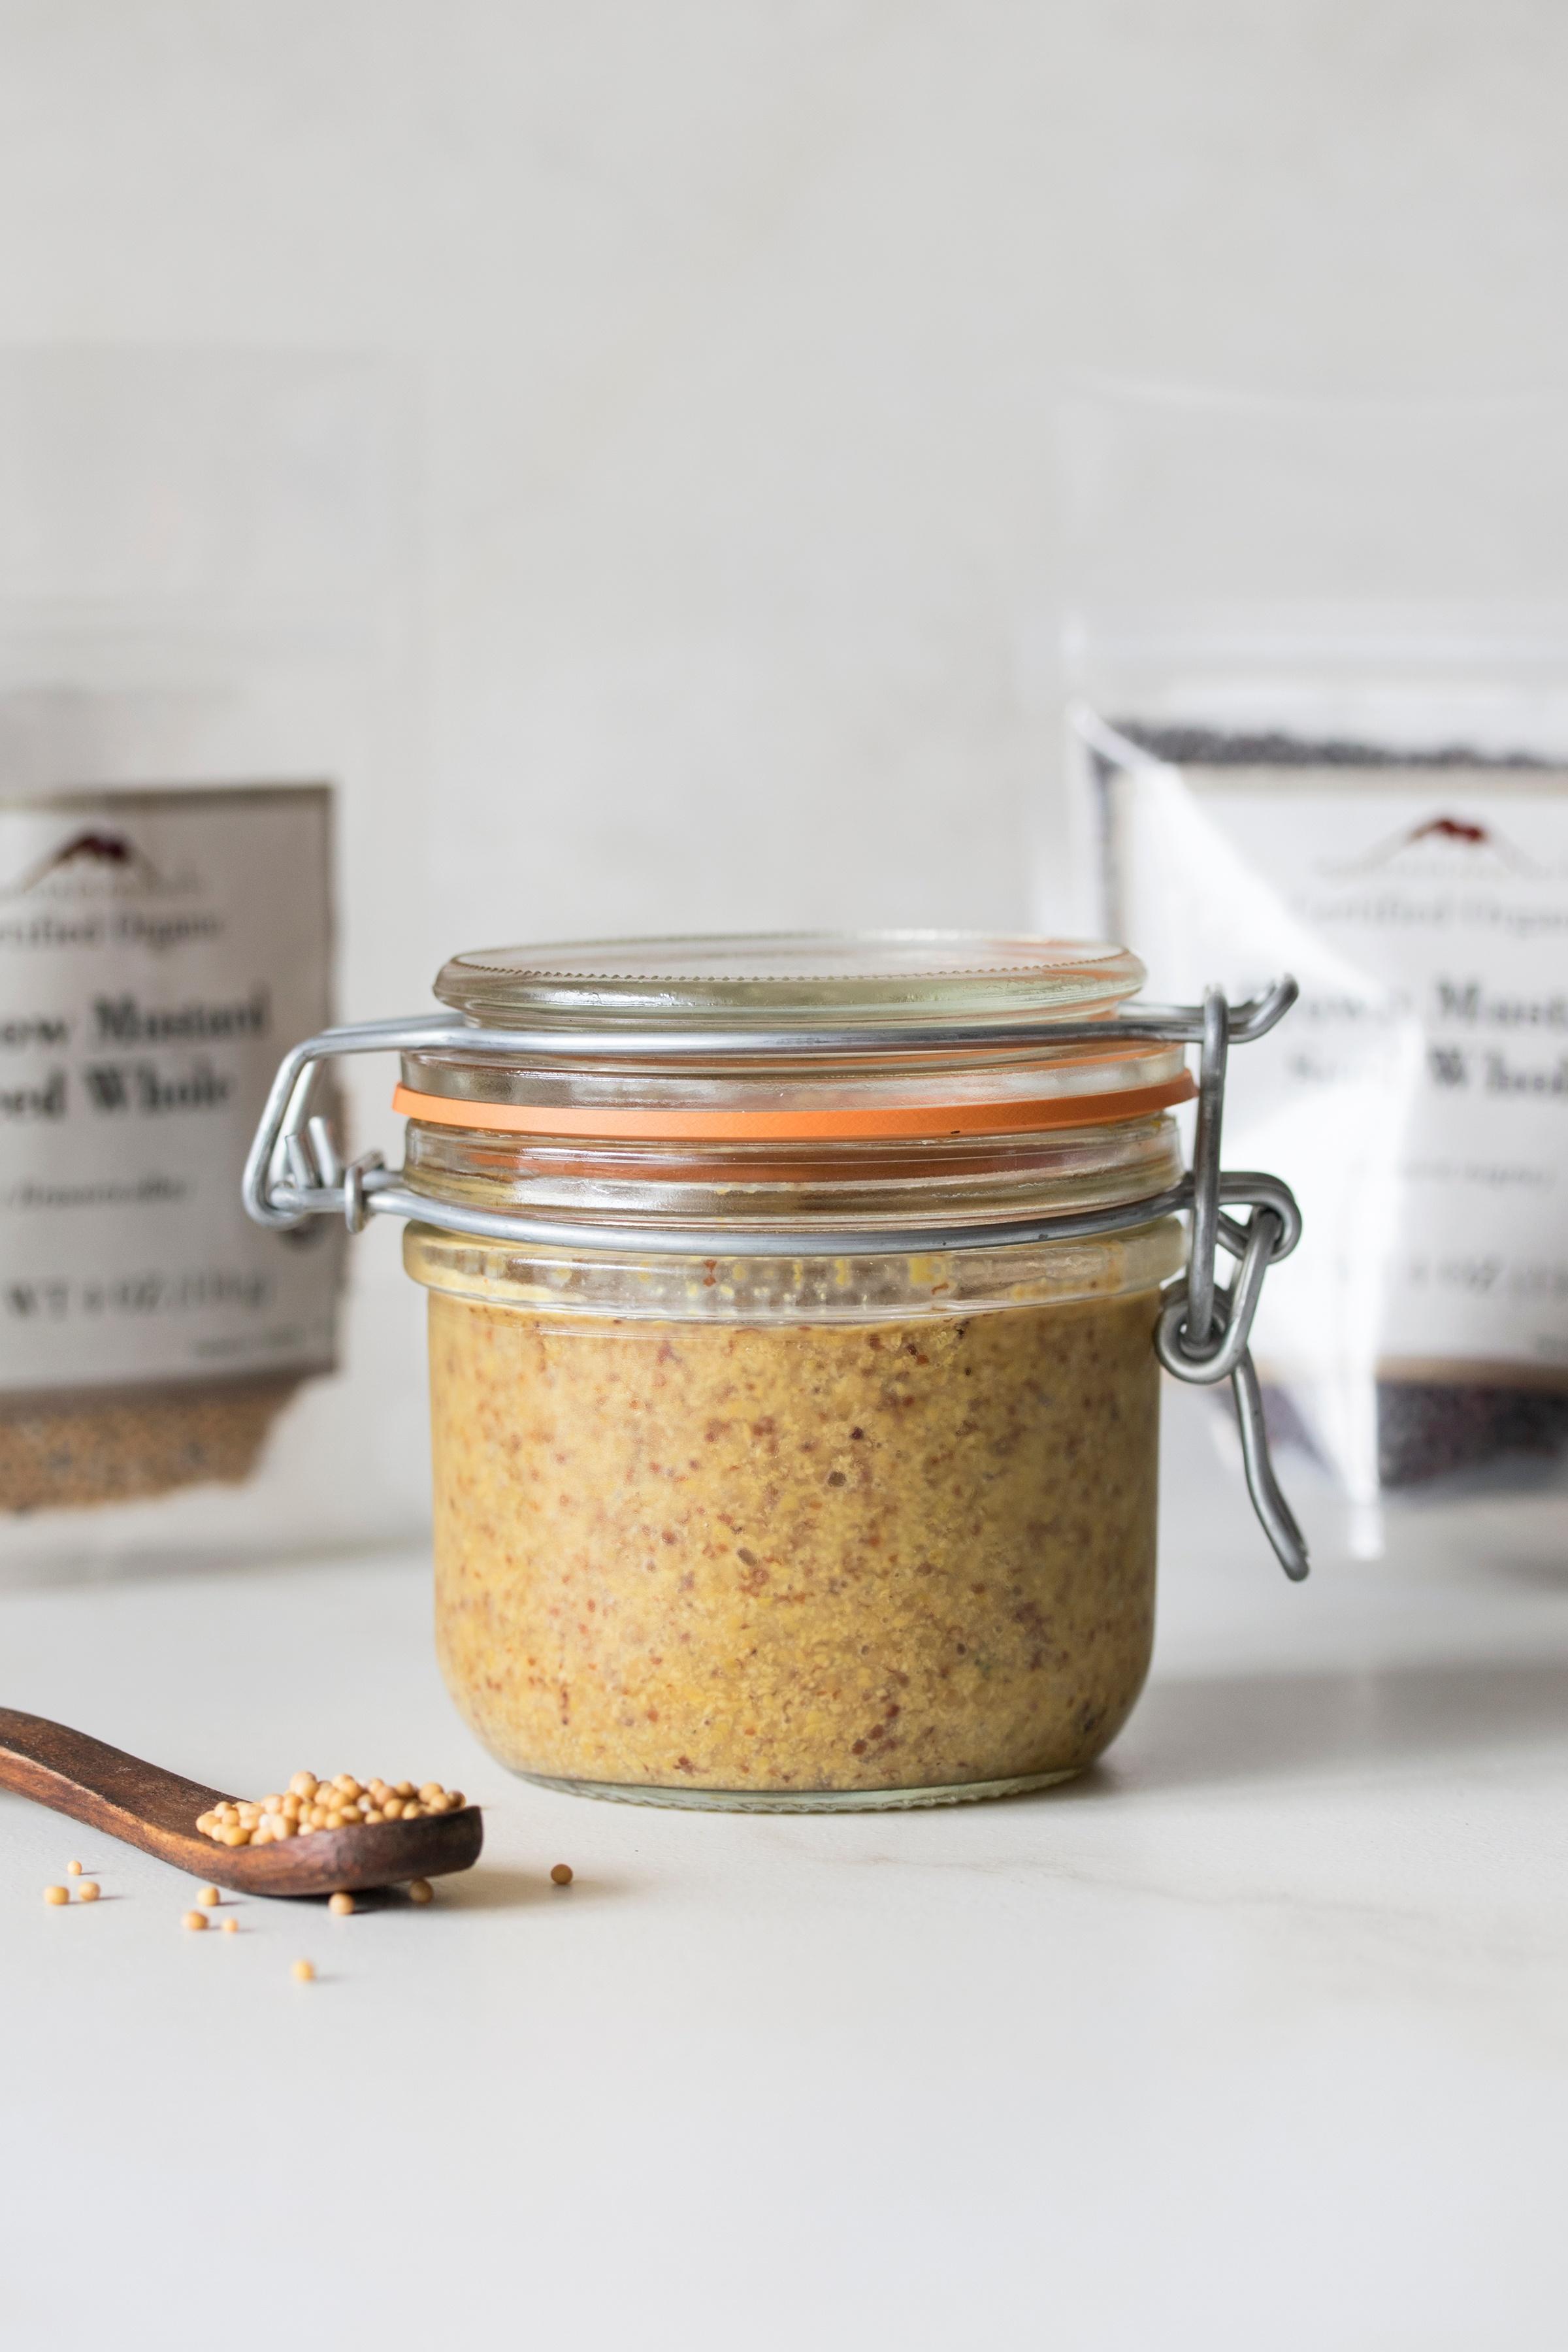 Pantry jar full of mustard with display of ingredients used to make it.